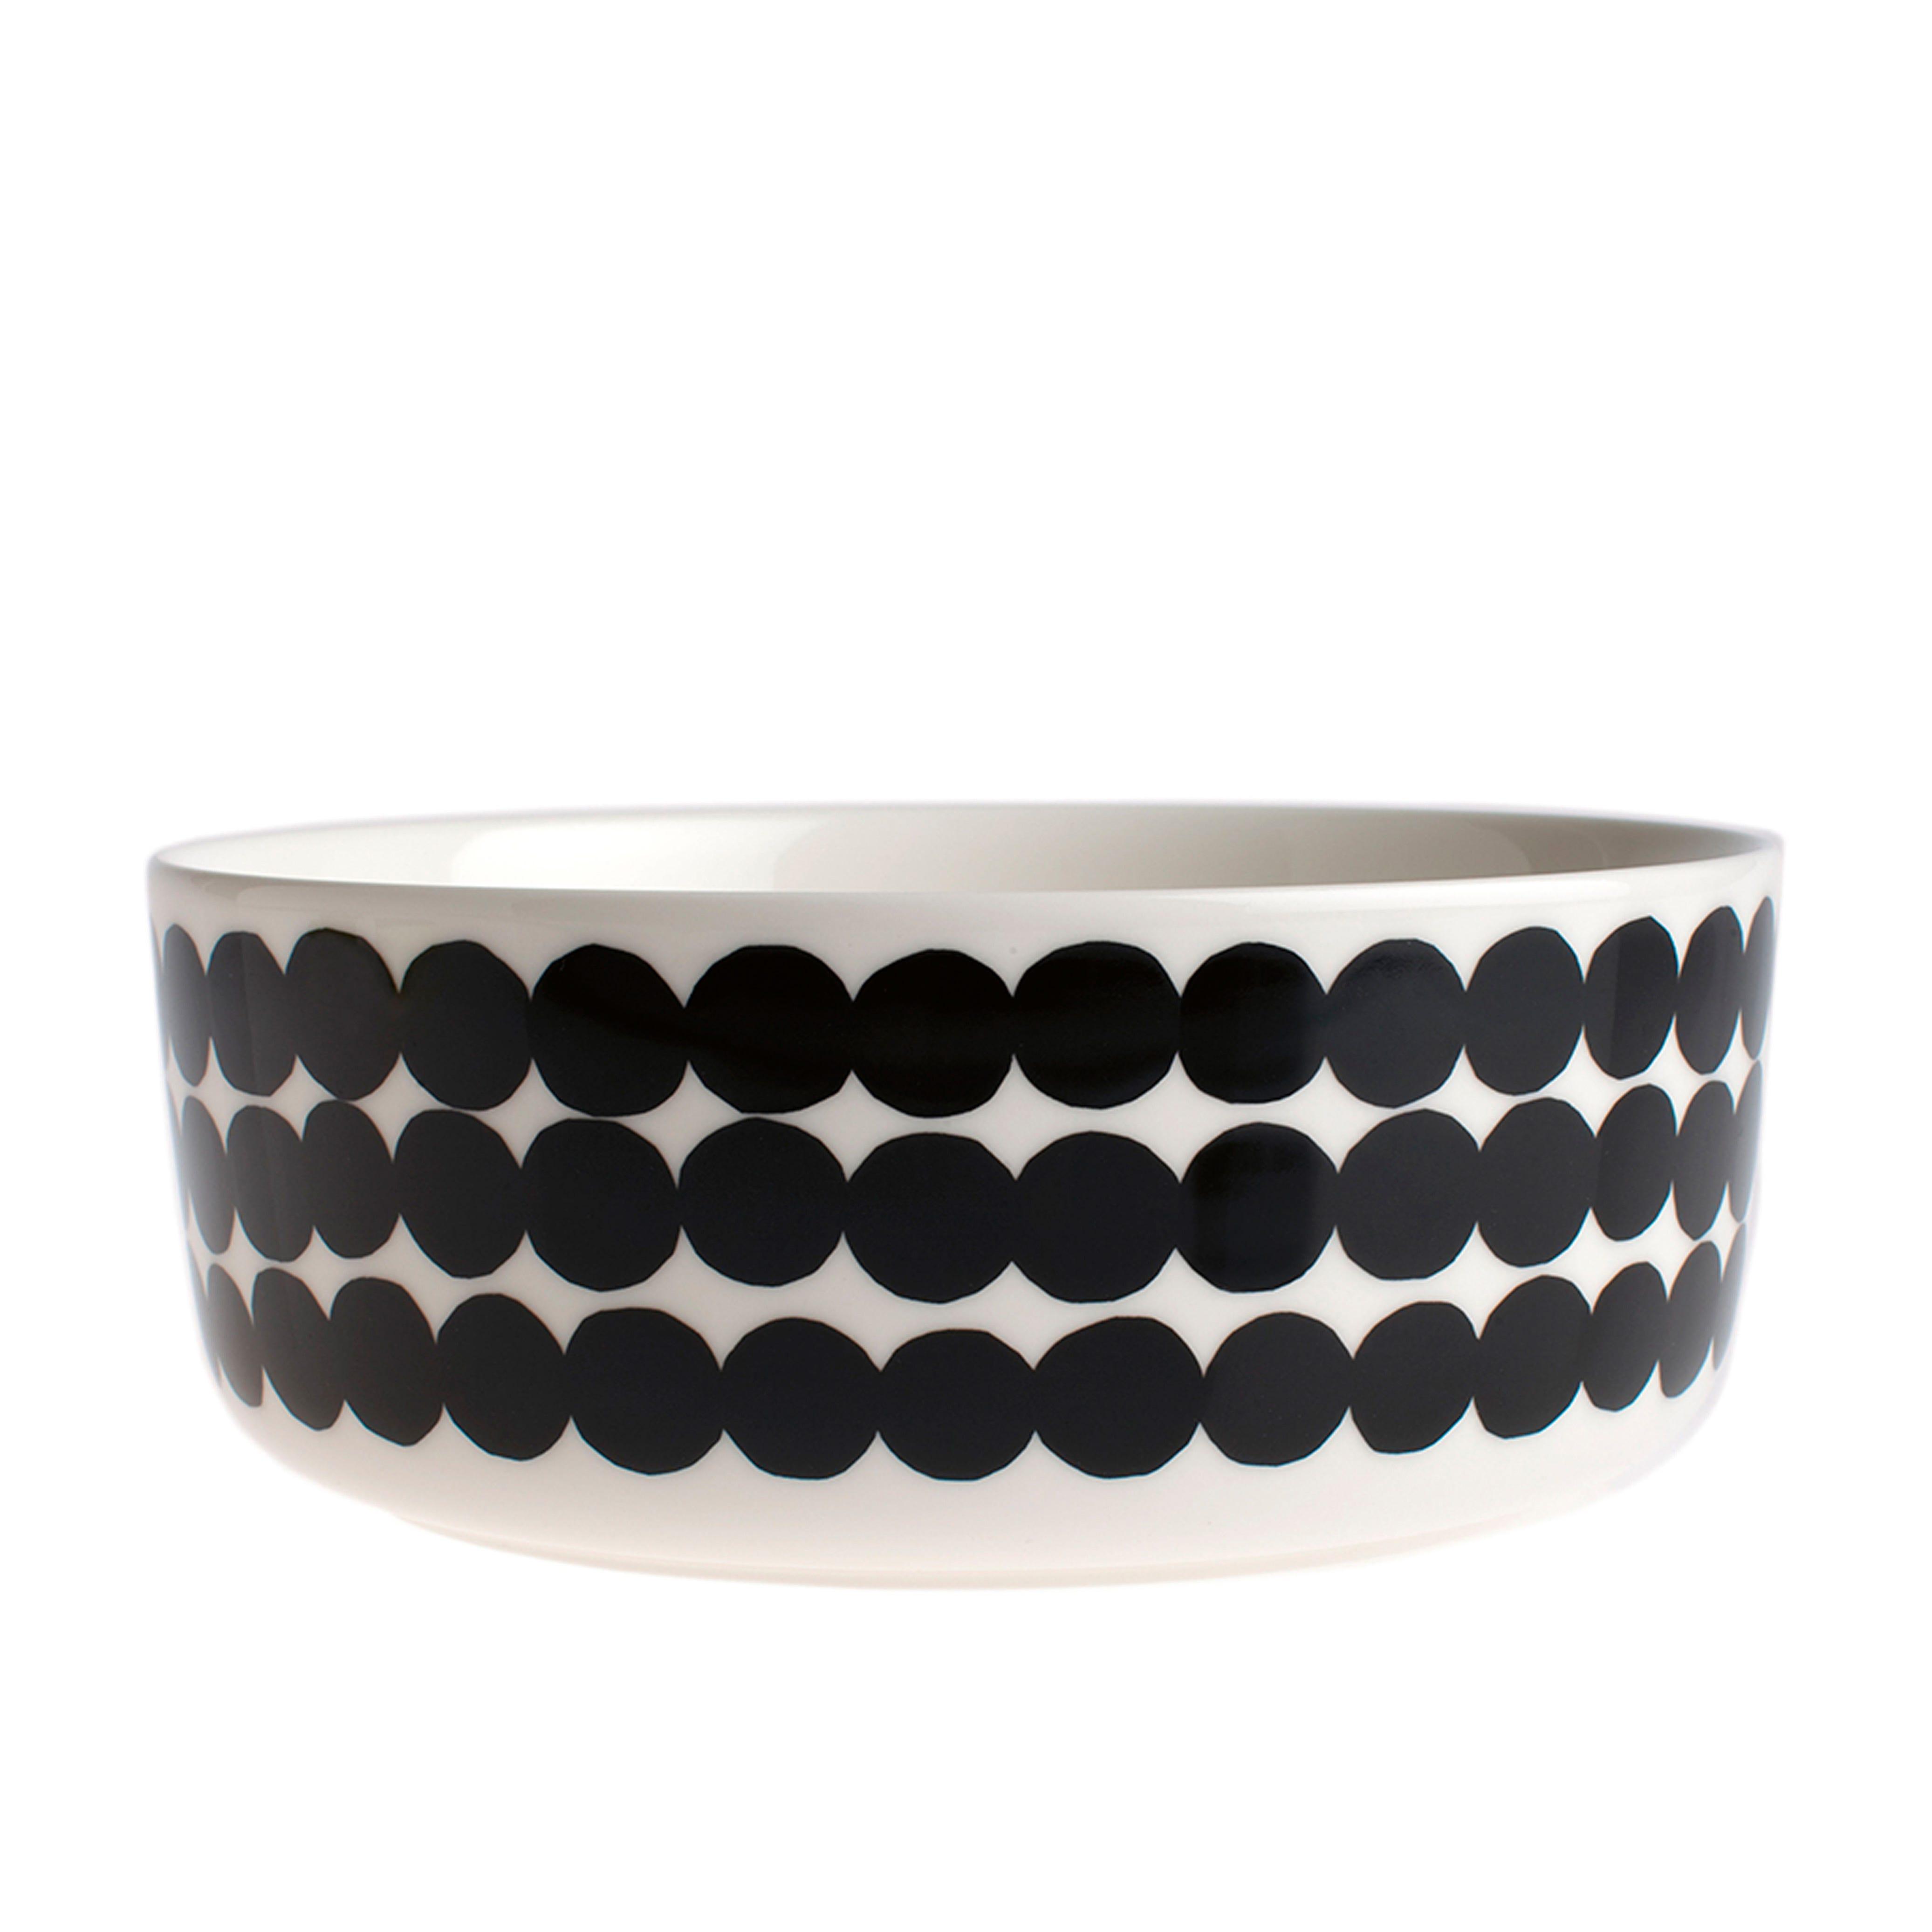 Rasymatto Bowl 20cm